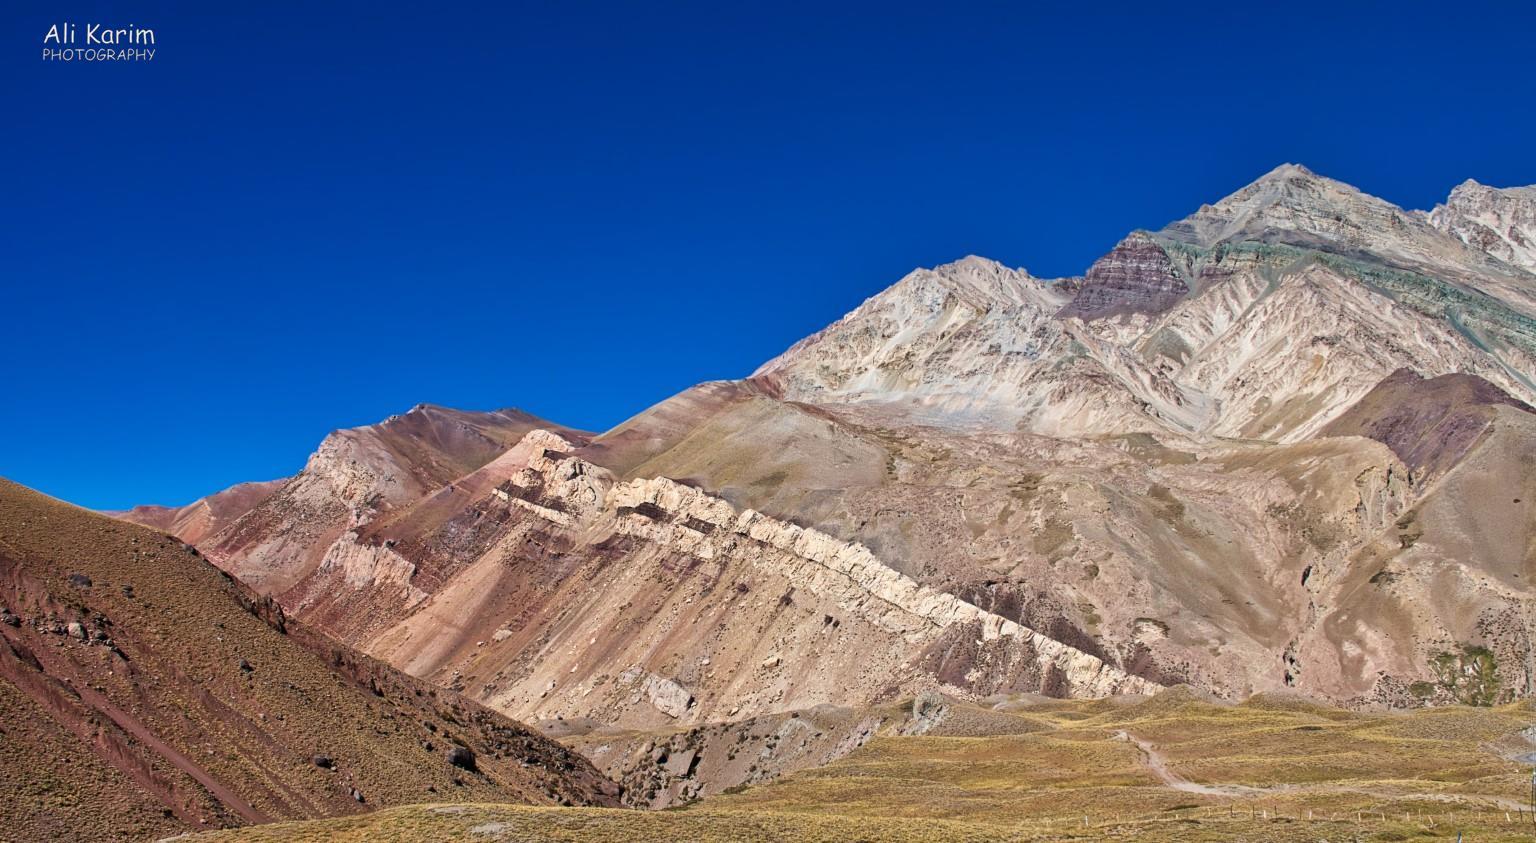 More Mendoza, Argentina Stunning landscapes